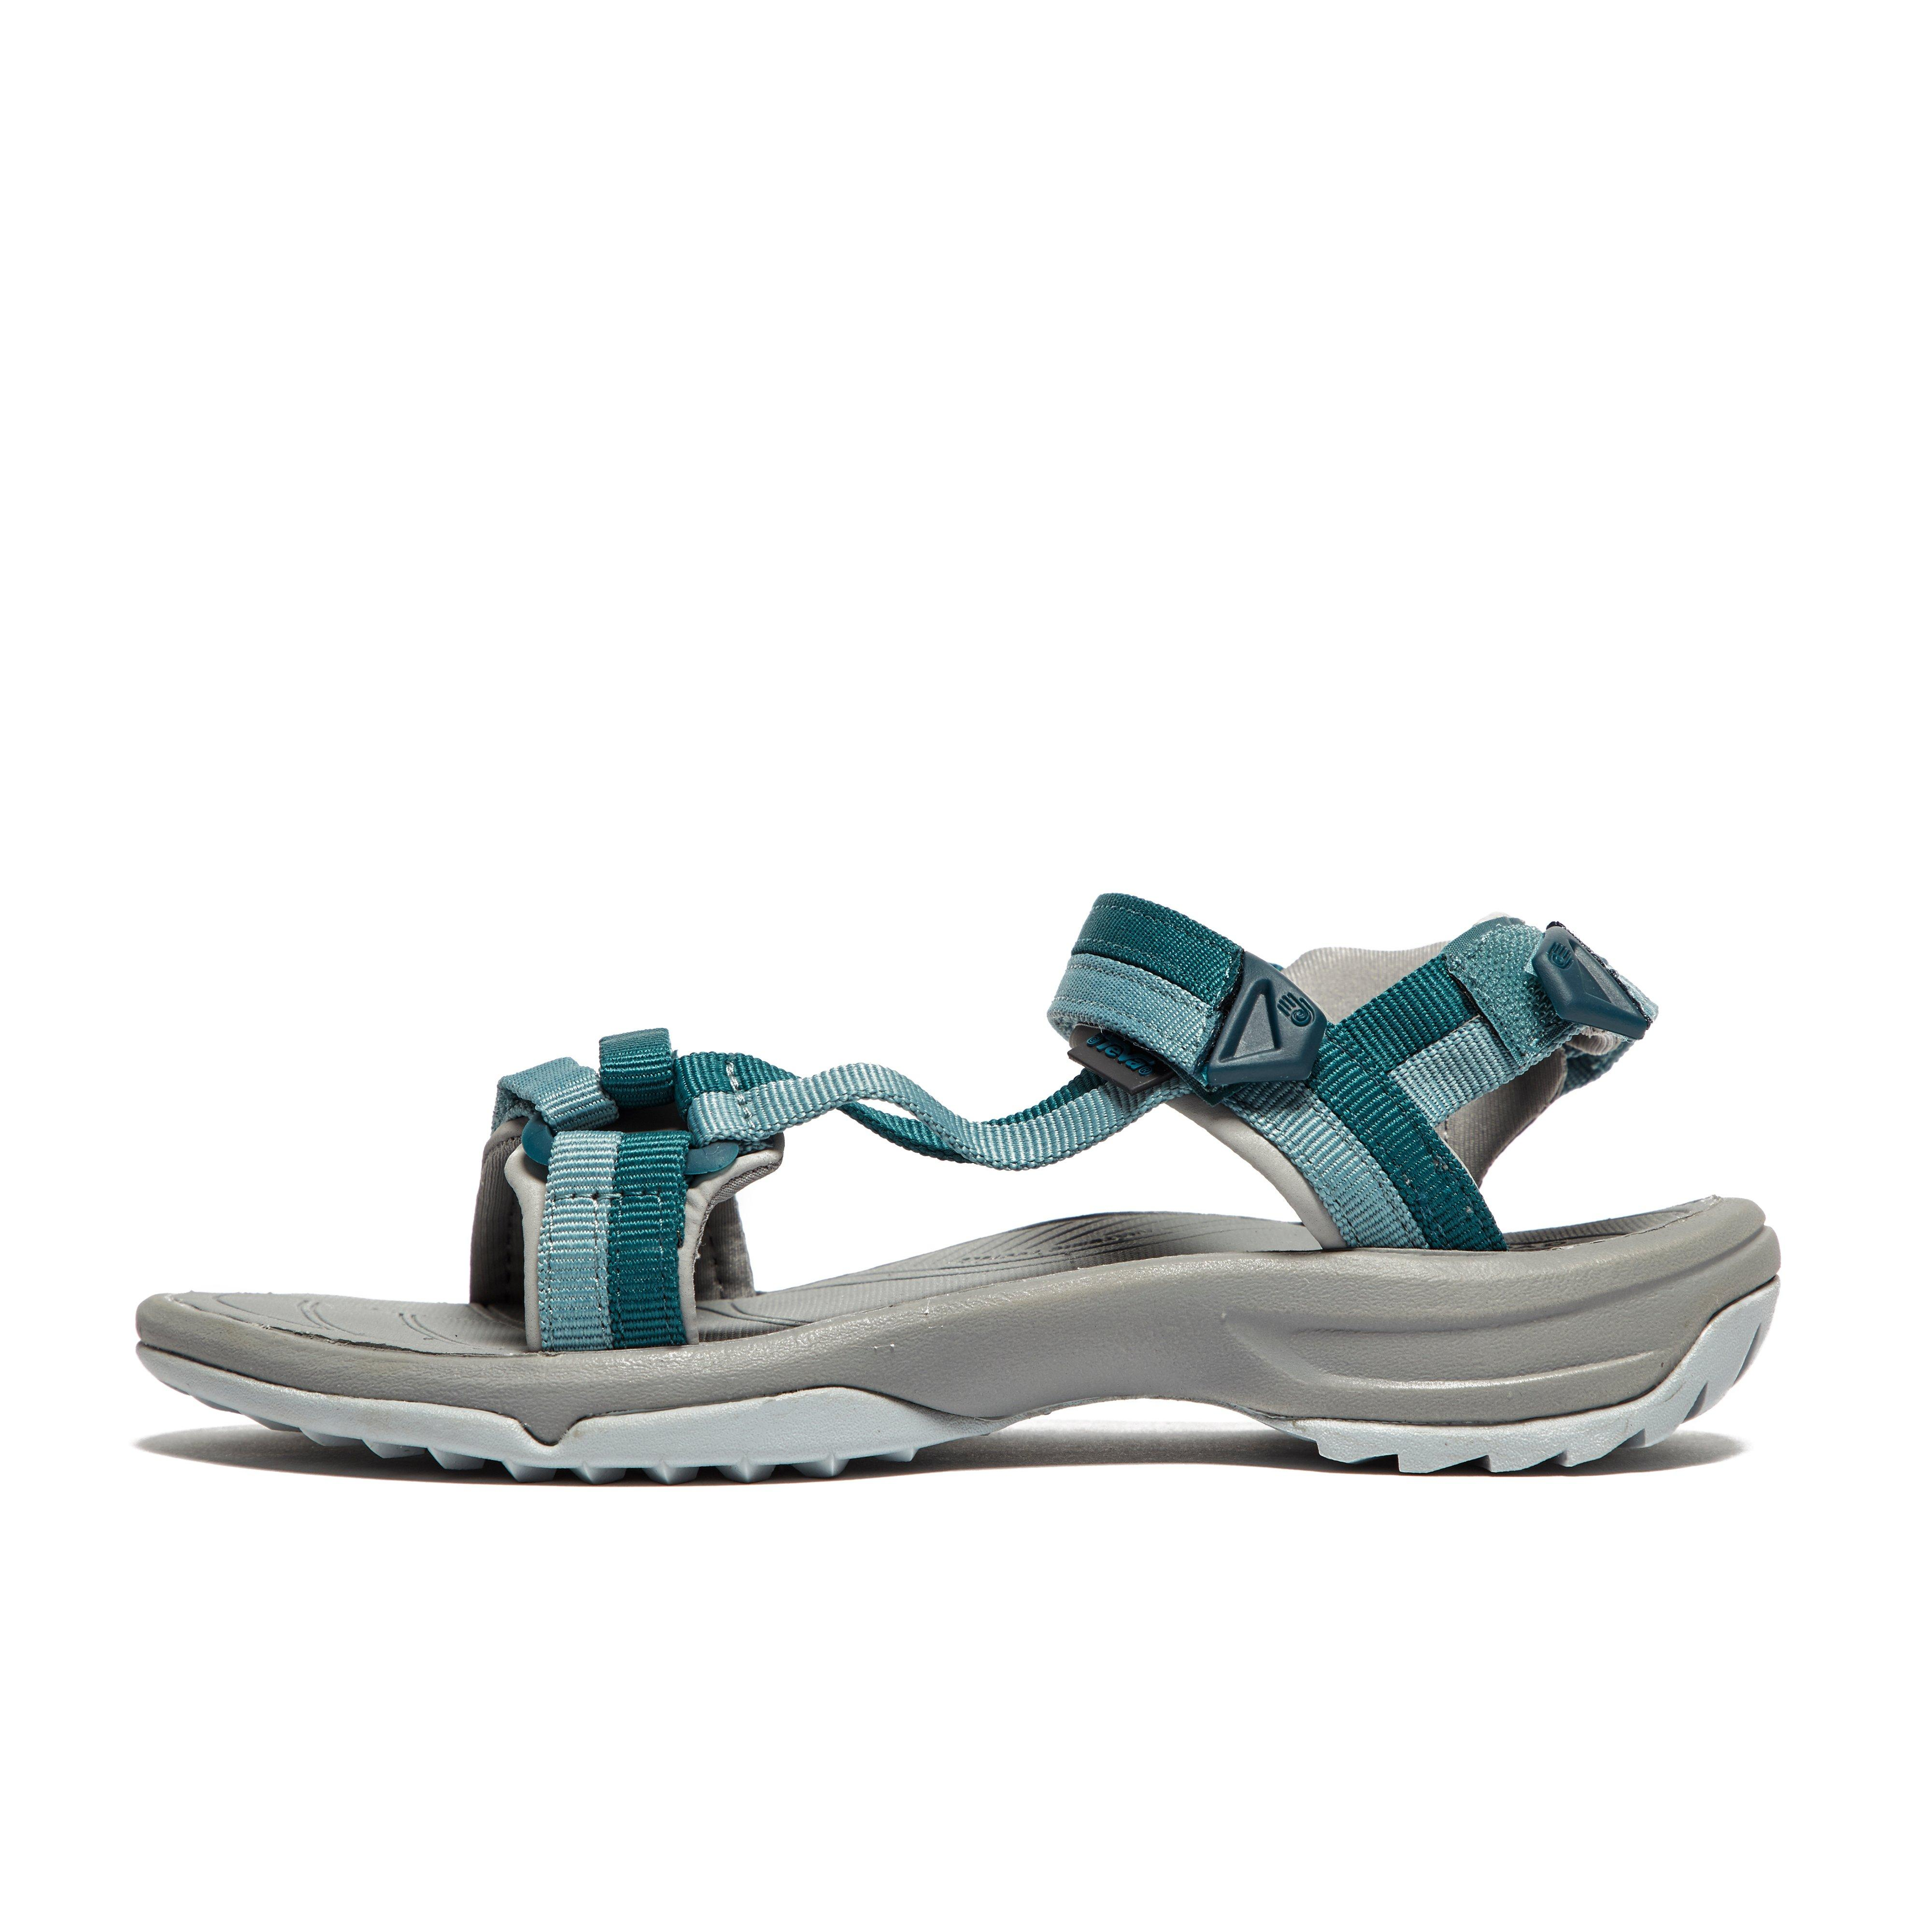 9ca38479584be Details about New Teva Terra Fi Lite Men s Walking Outdoor Footwear Sandals  Green